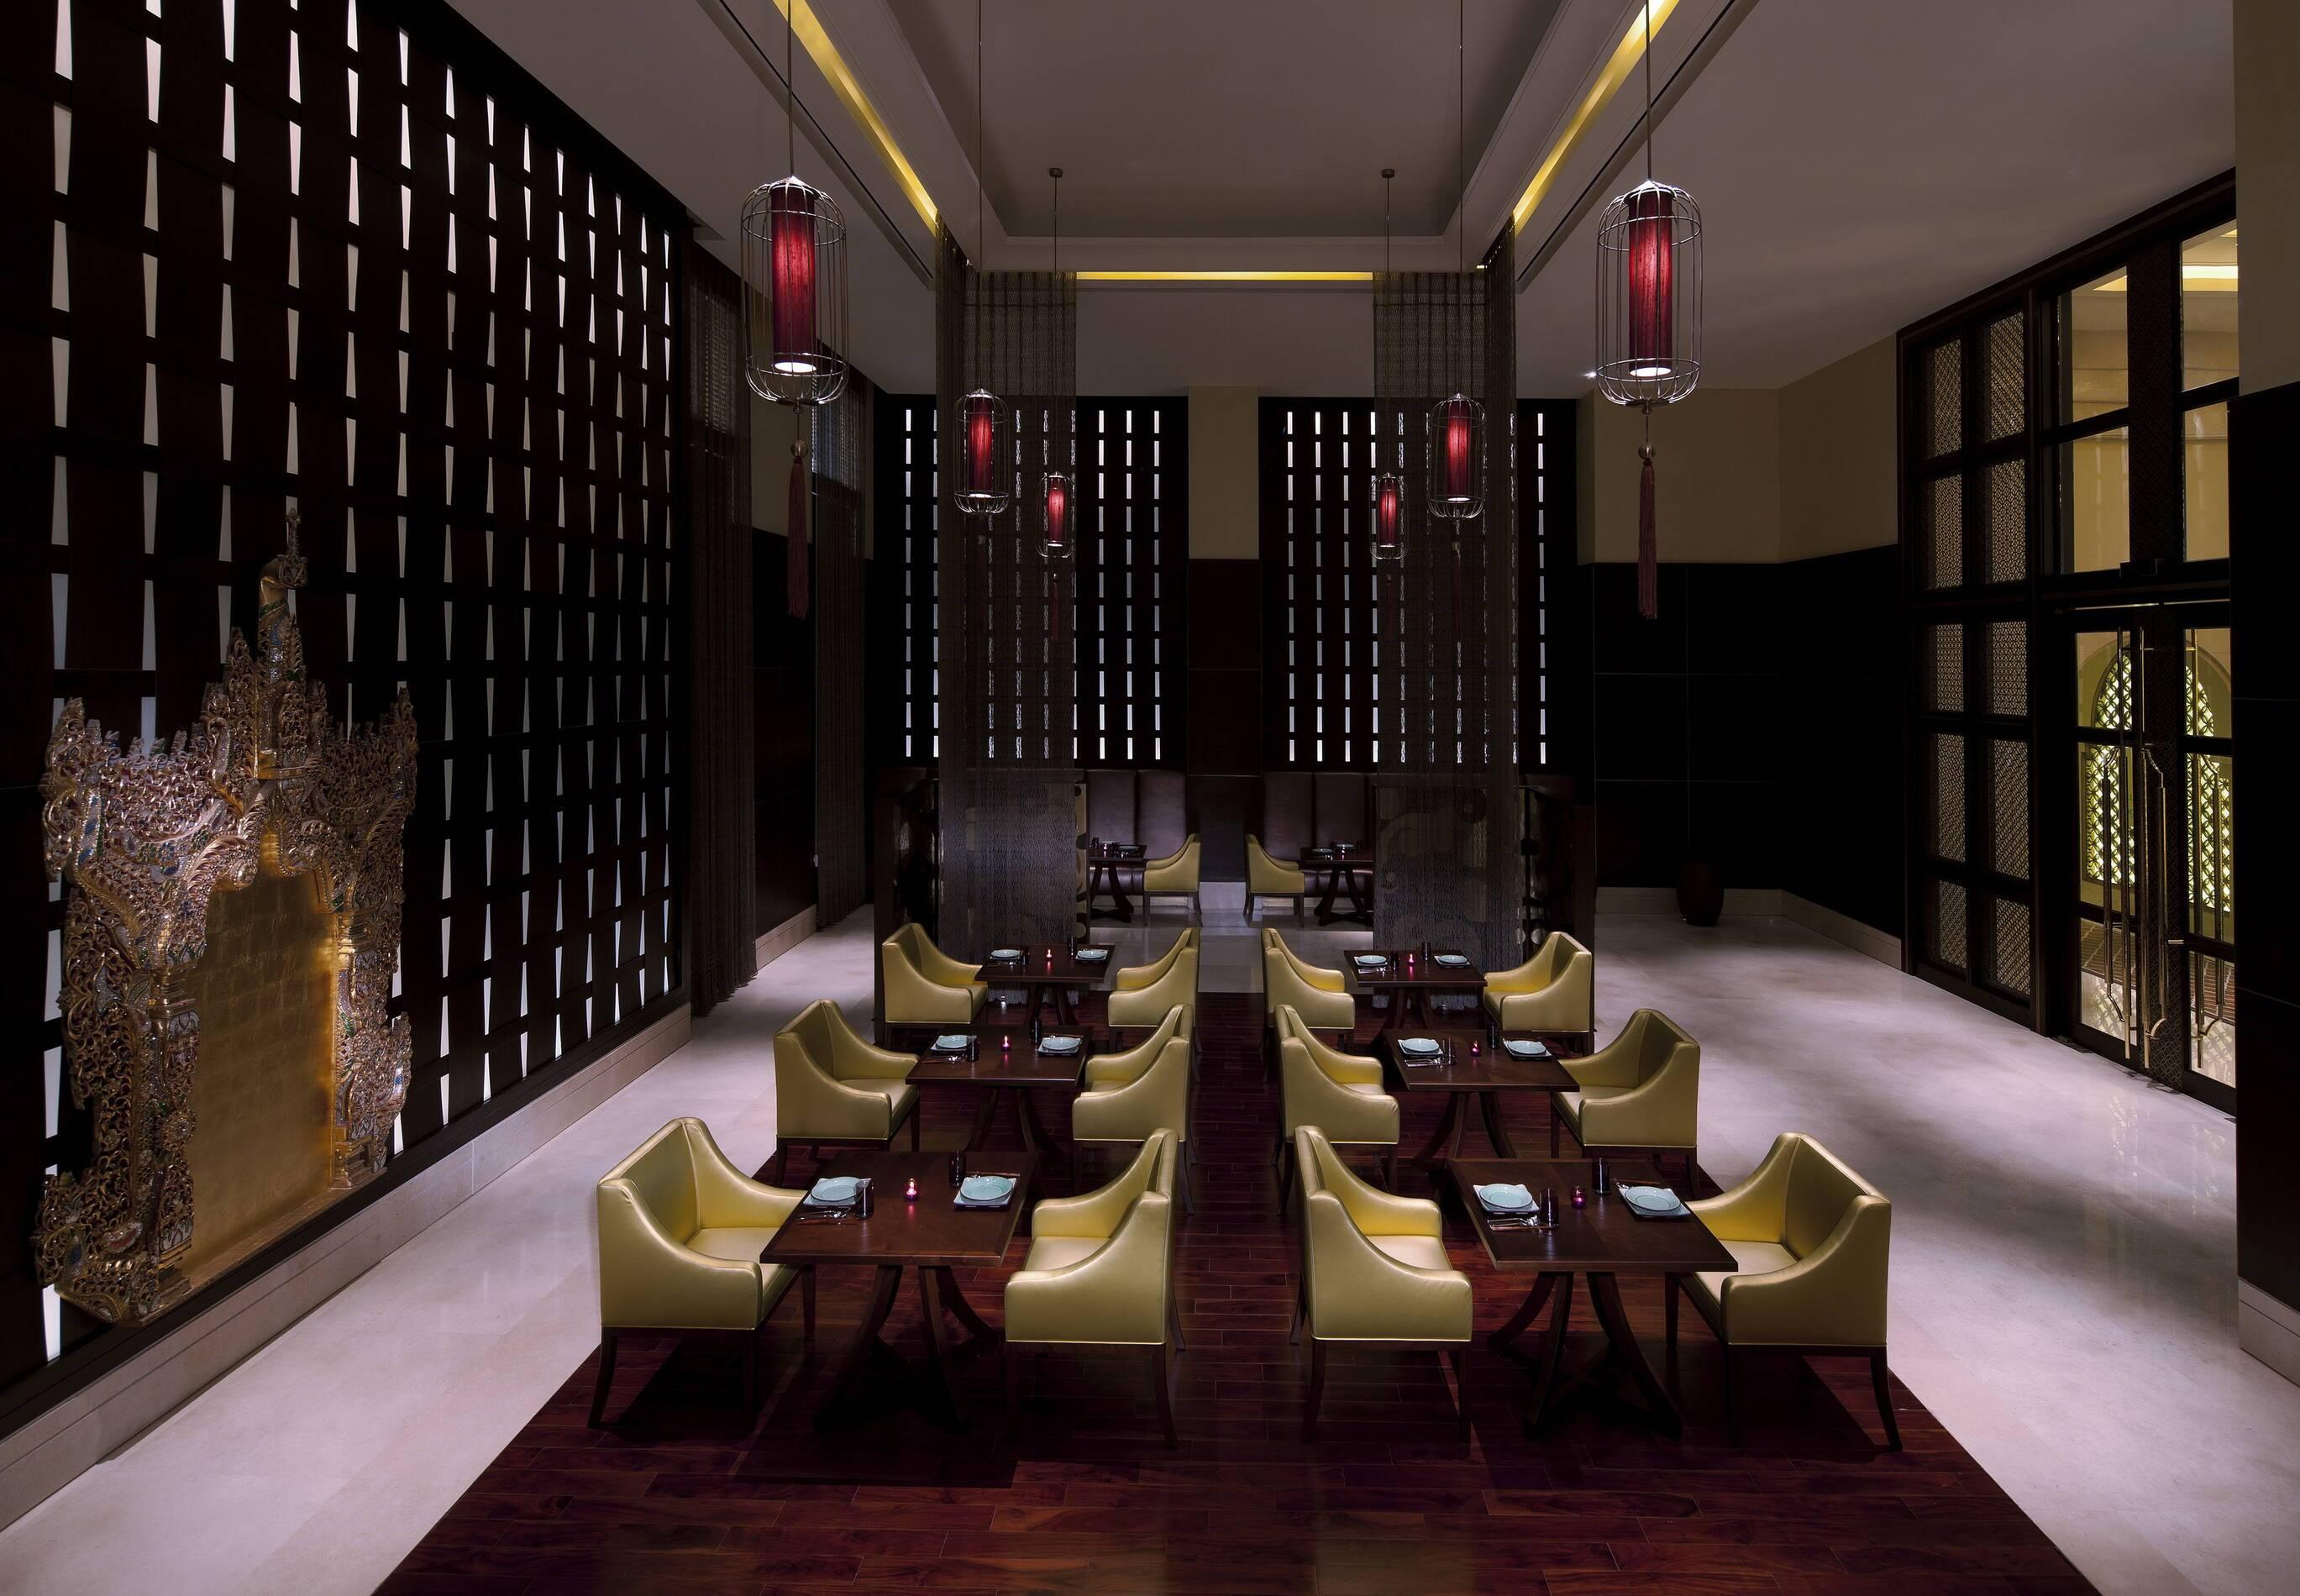 Anantara Eastern Mangroves Abu Dhabi restaurant pachaylen